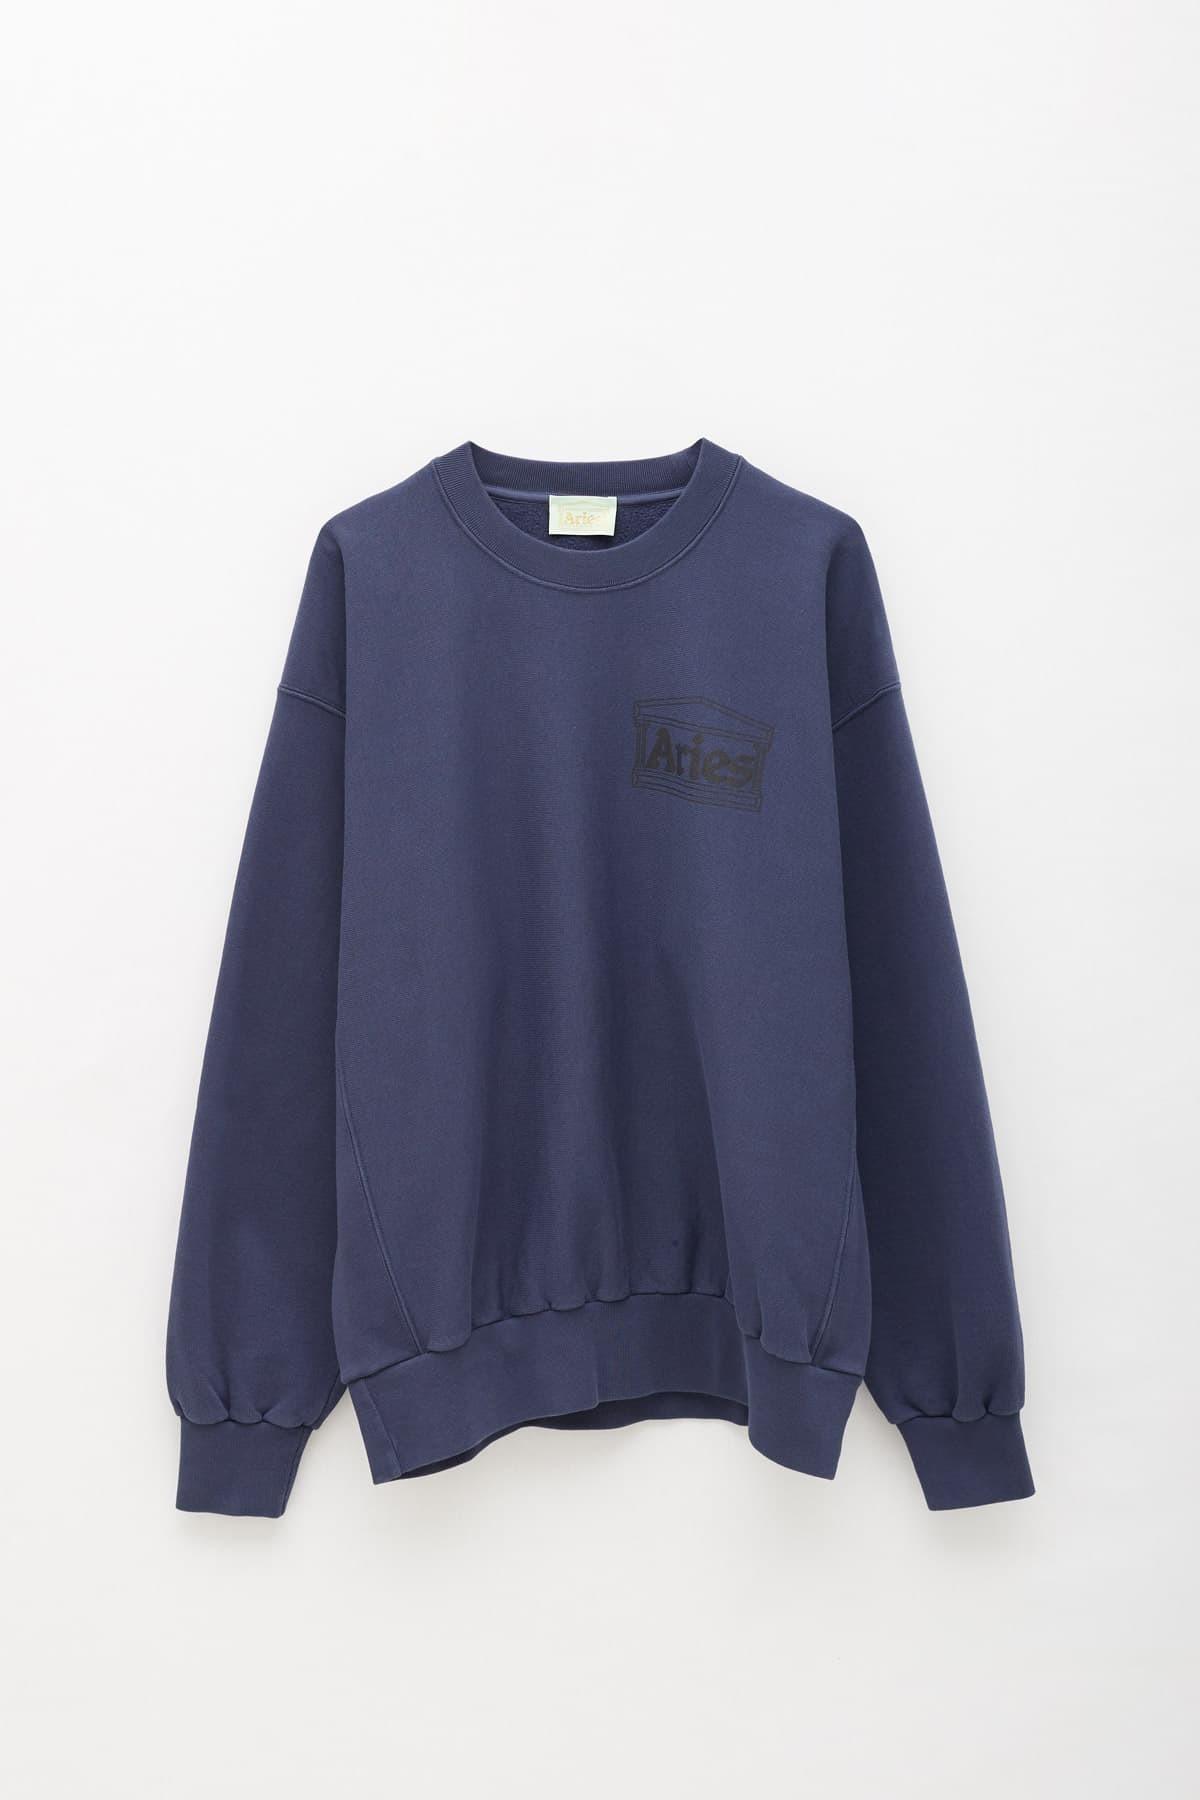 Acne Studios Optic White Erin Stamp Dress T-Shirt